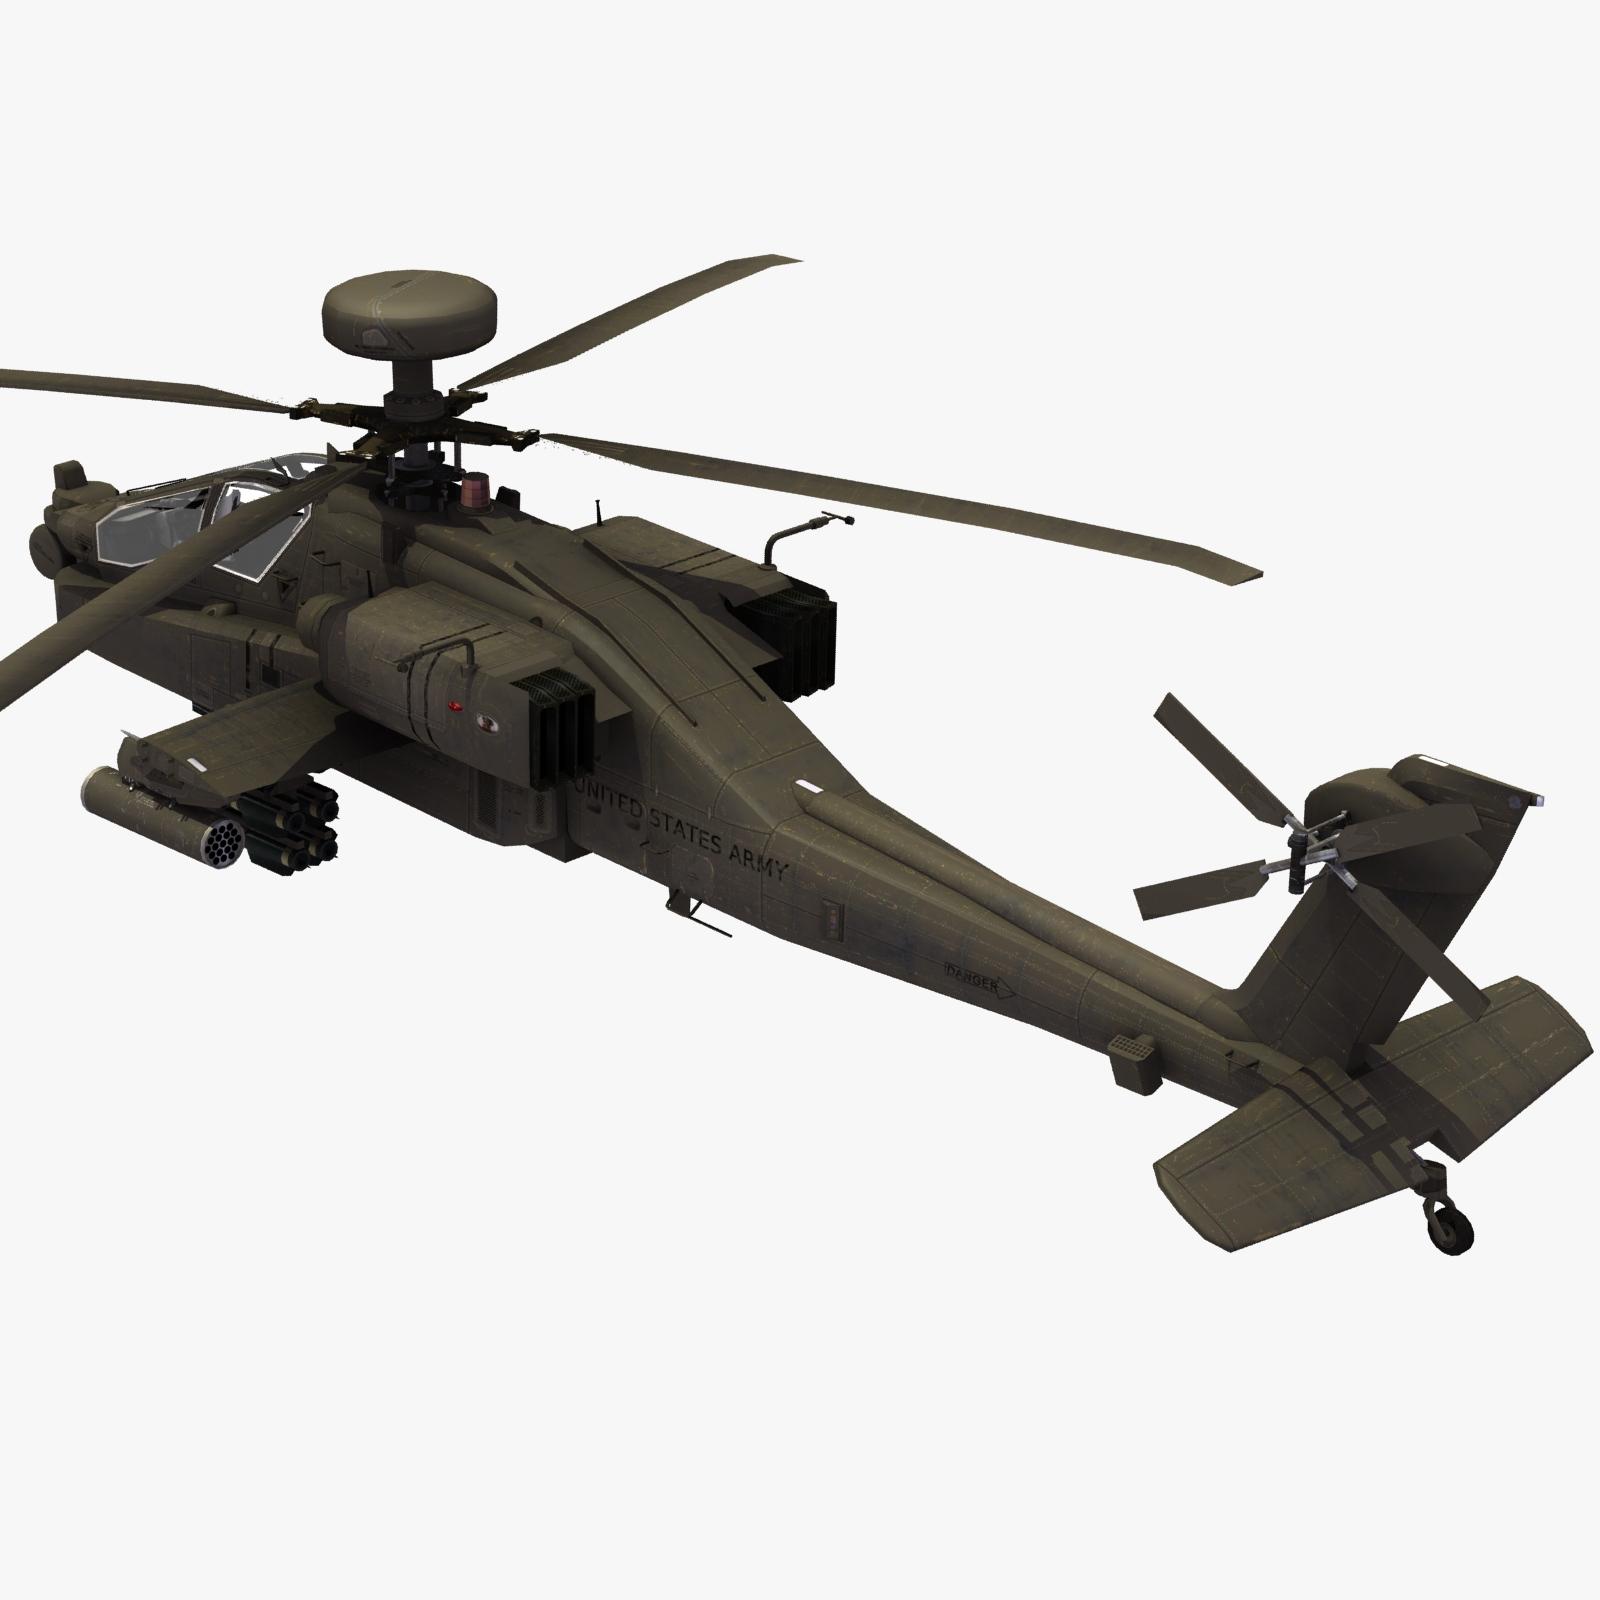 ah1w cobra attack helicopter 3D Models - CGTrader.com